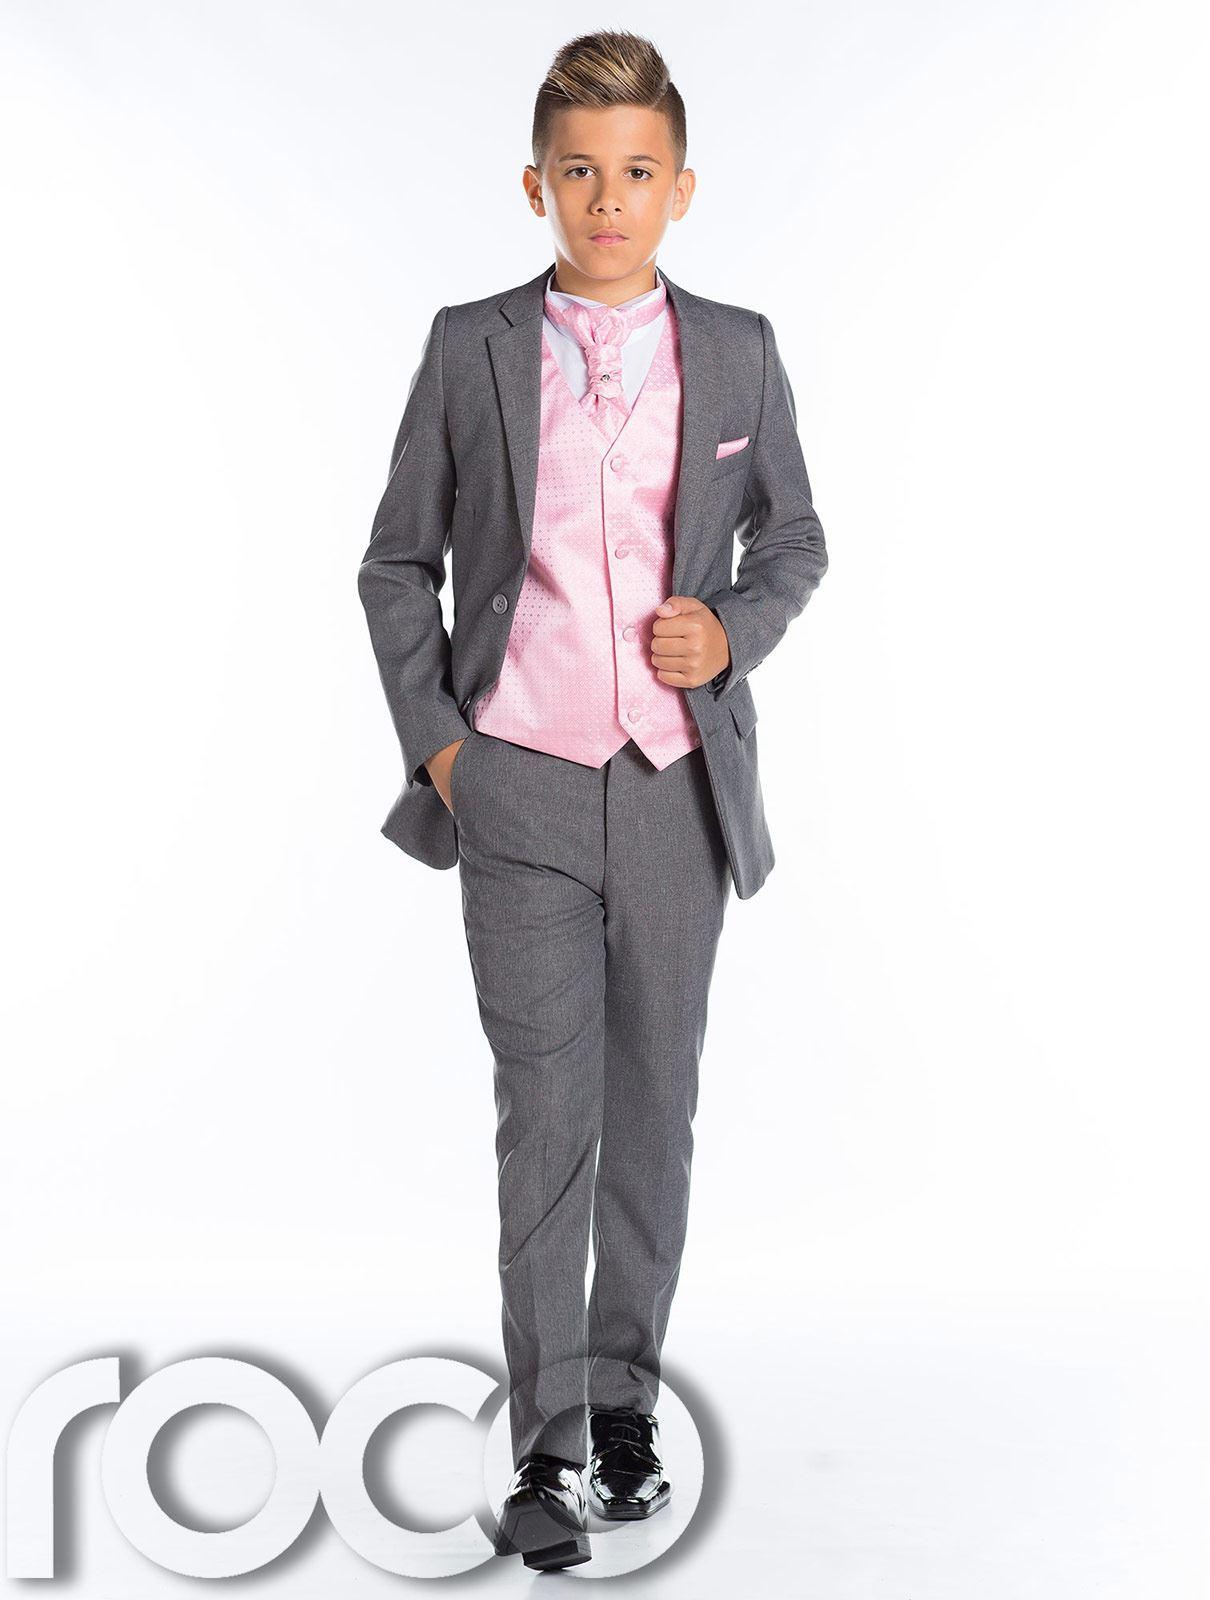 Garçons costume de mariage slim costume garçons gris suit Costume Gris garçons costume de bal